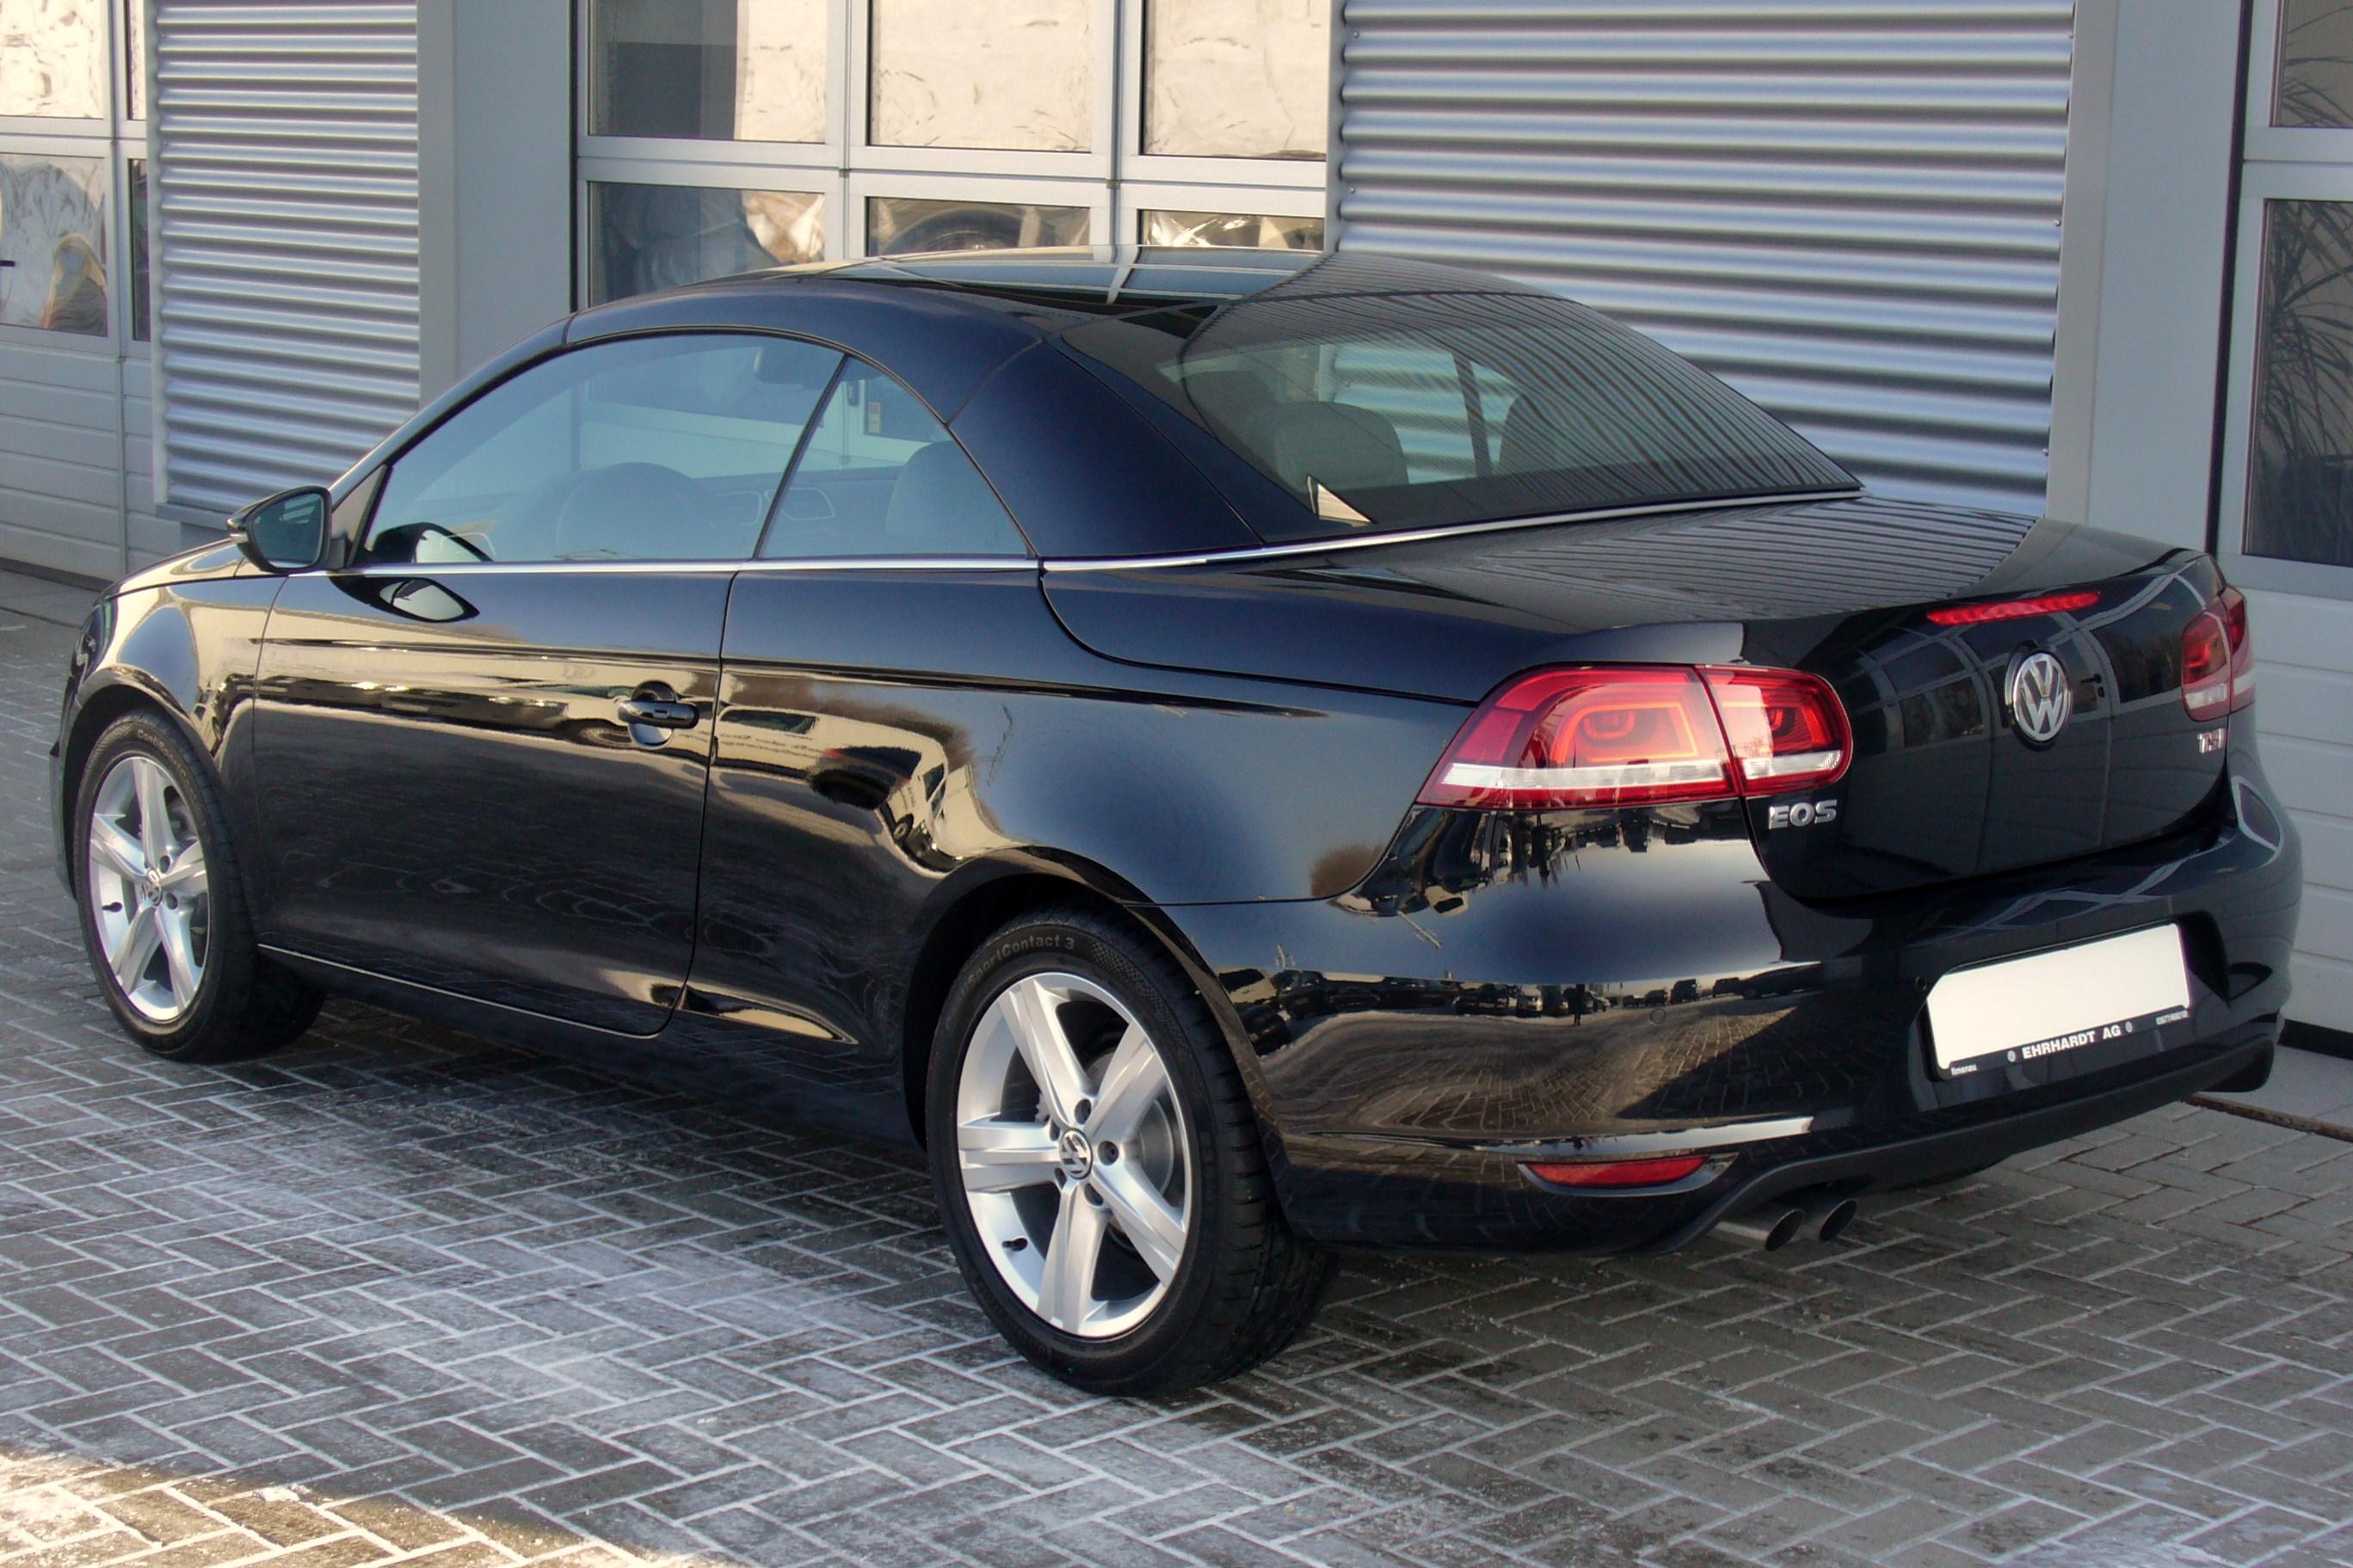 File:VW Eos Facelift 1.4 TSI Deep Black Interieur.JPG - Wikimedia ...